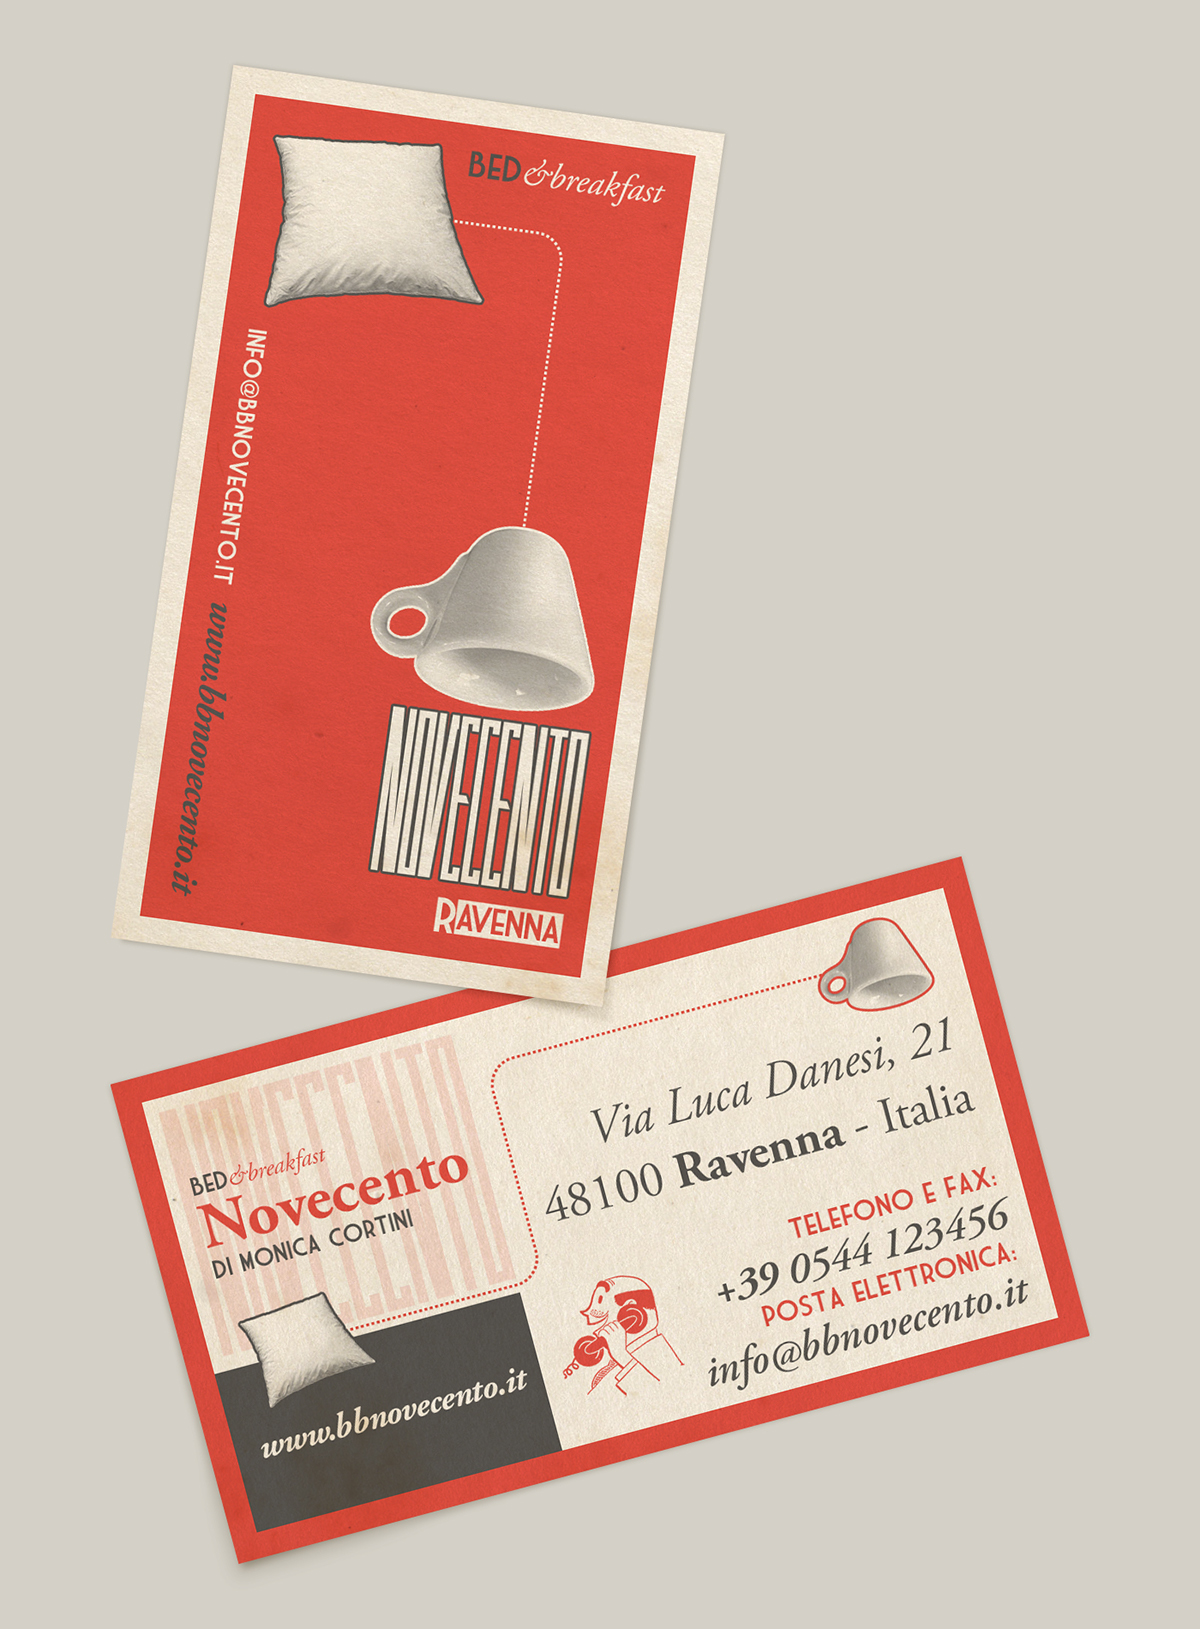 constructivism,red,paper,bed&breakfast,B&B,novecento,ravenna